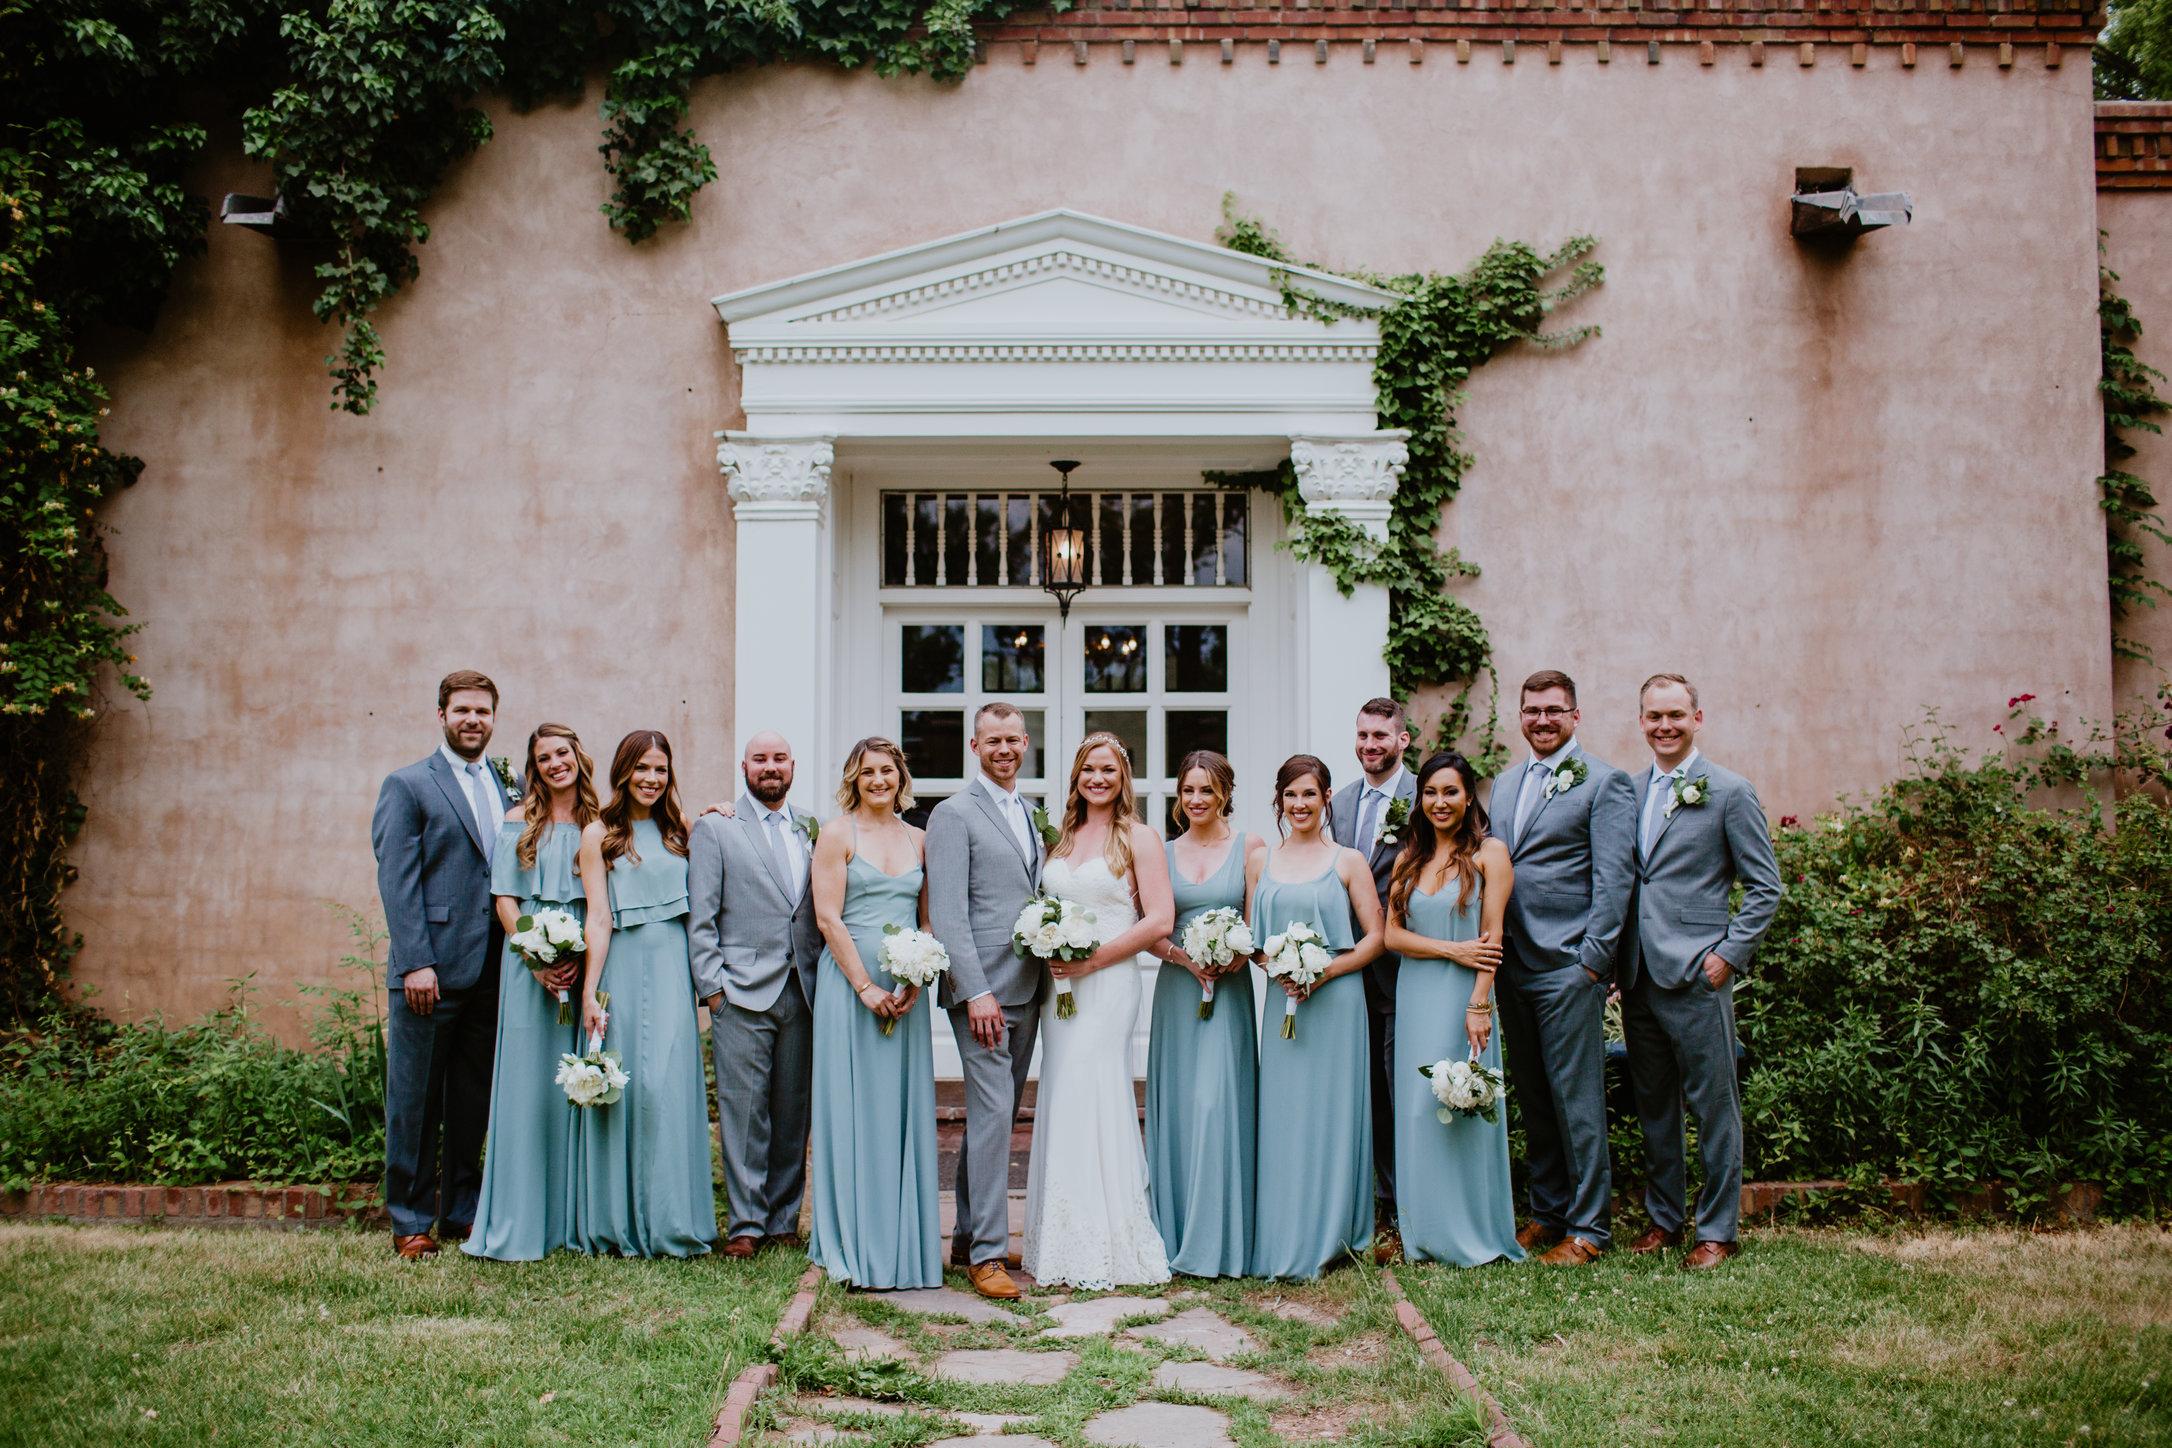 DandA-wedding-417.jpg